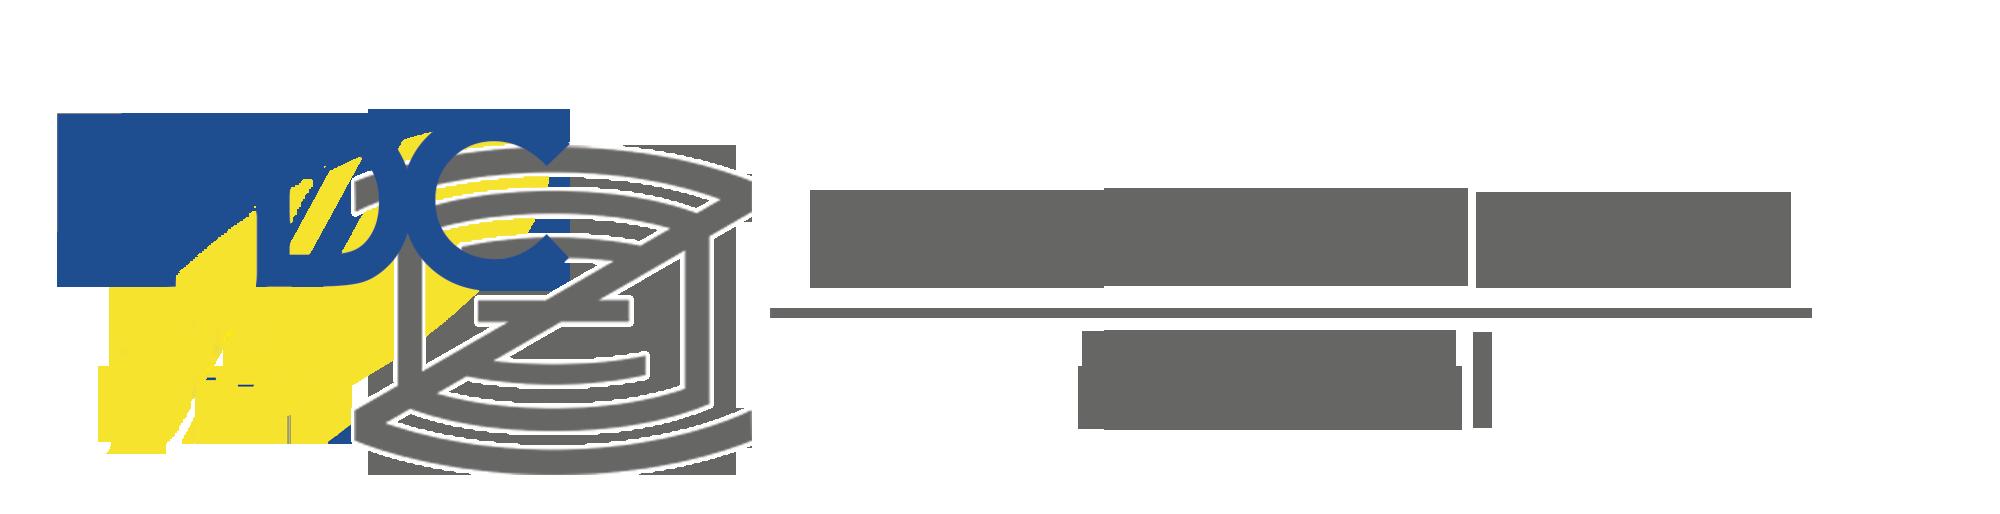 tdc-center-logo.png